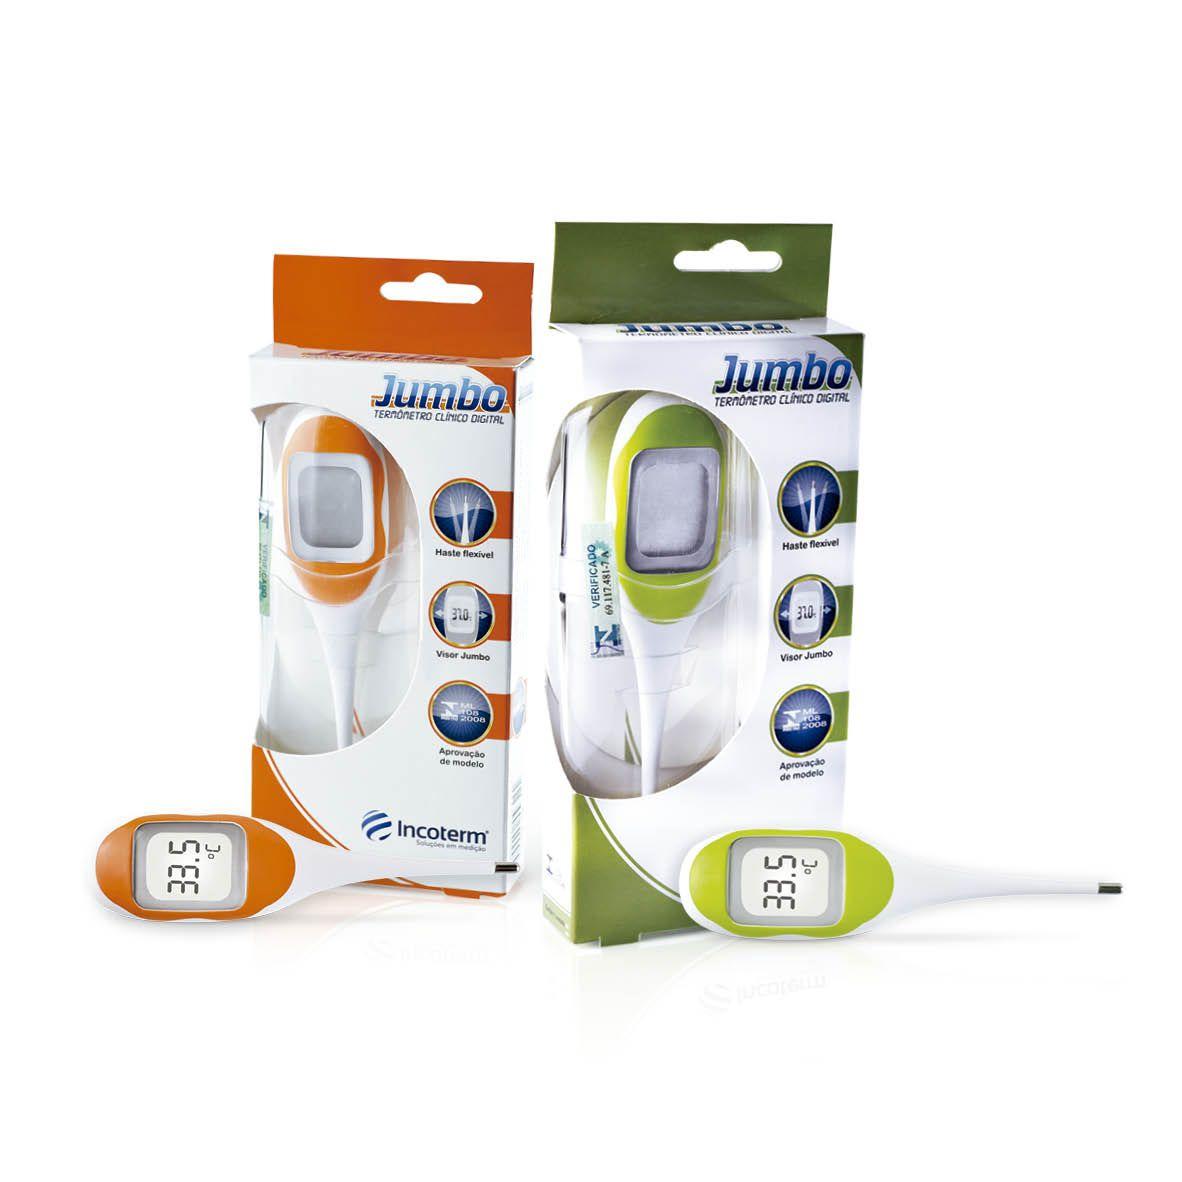 Termômetro Clínico Digital Jumbo - Verde